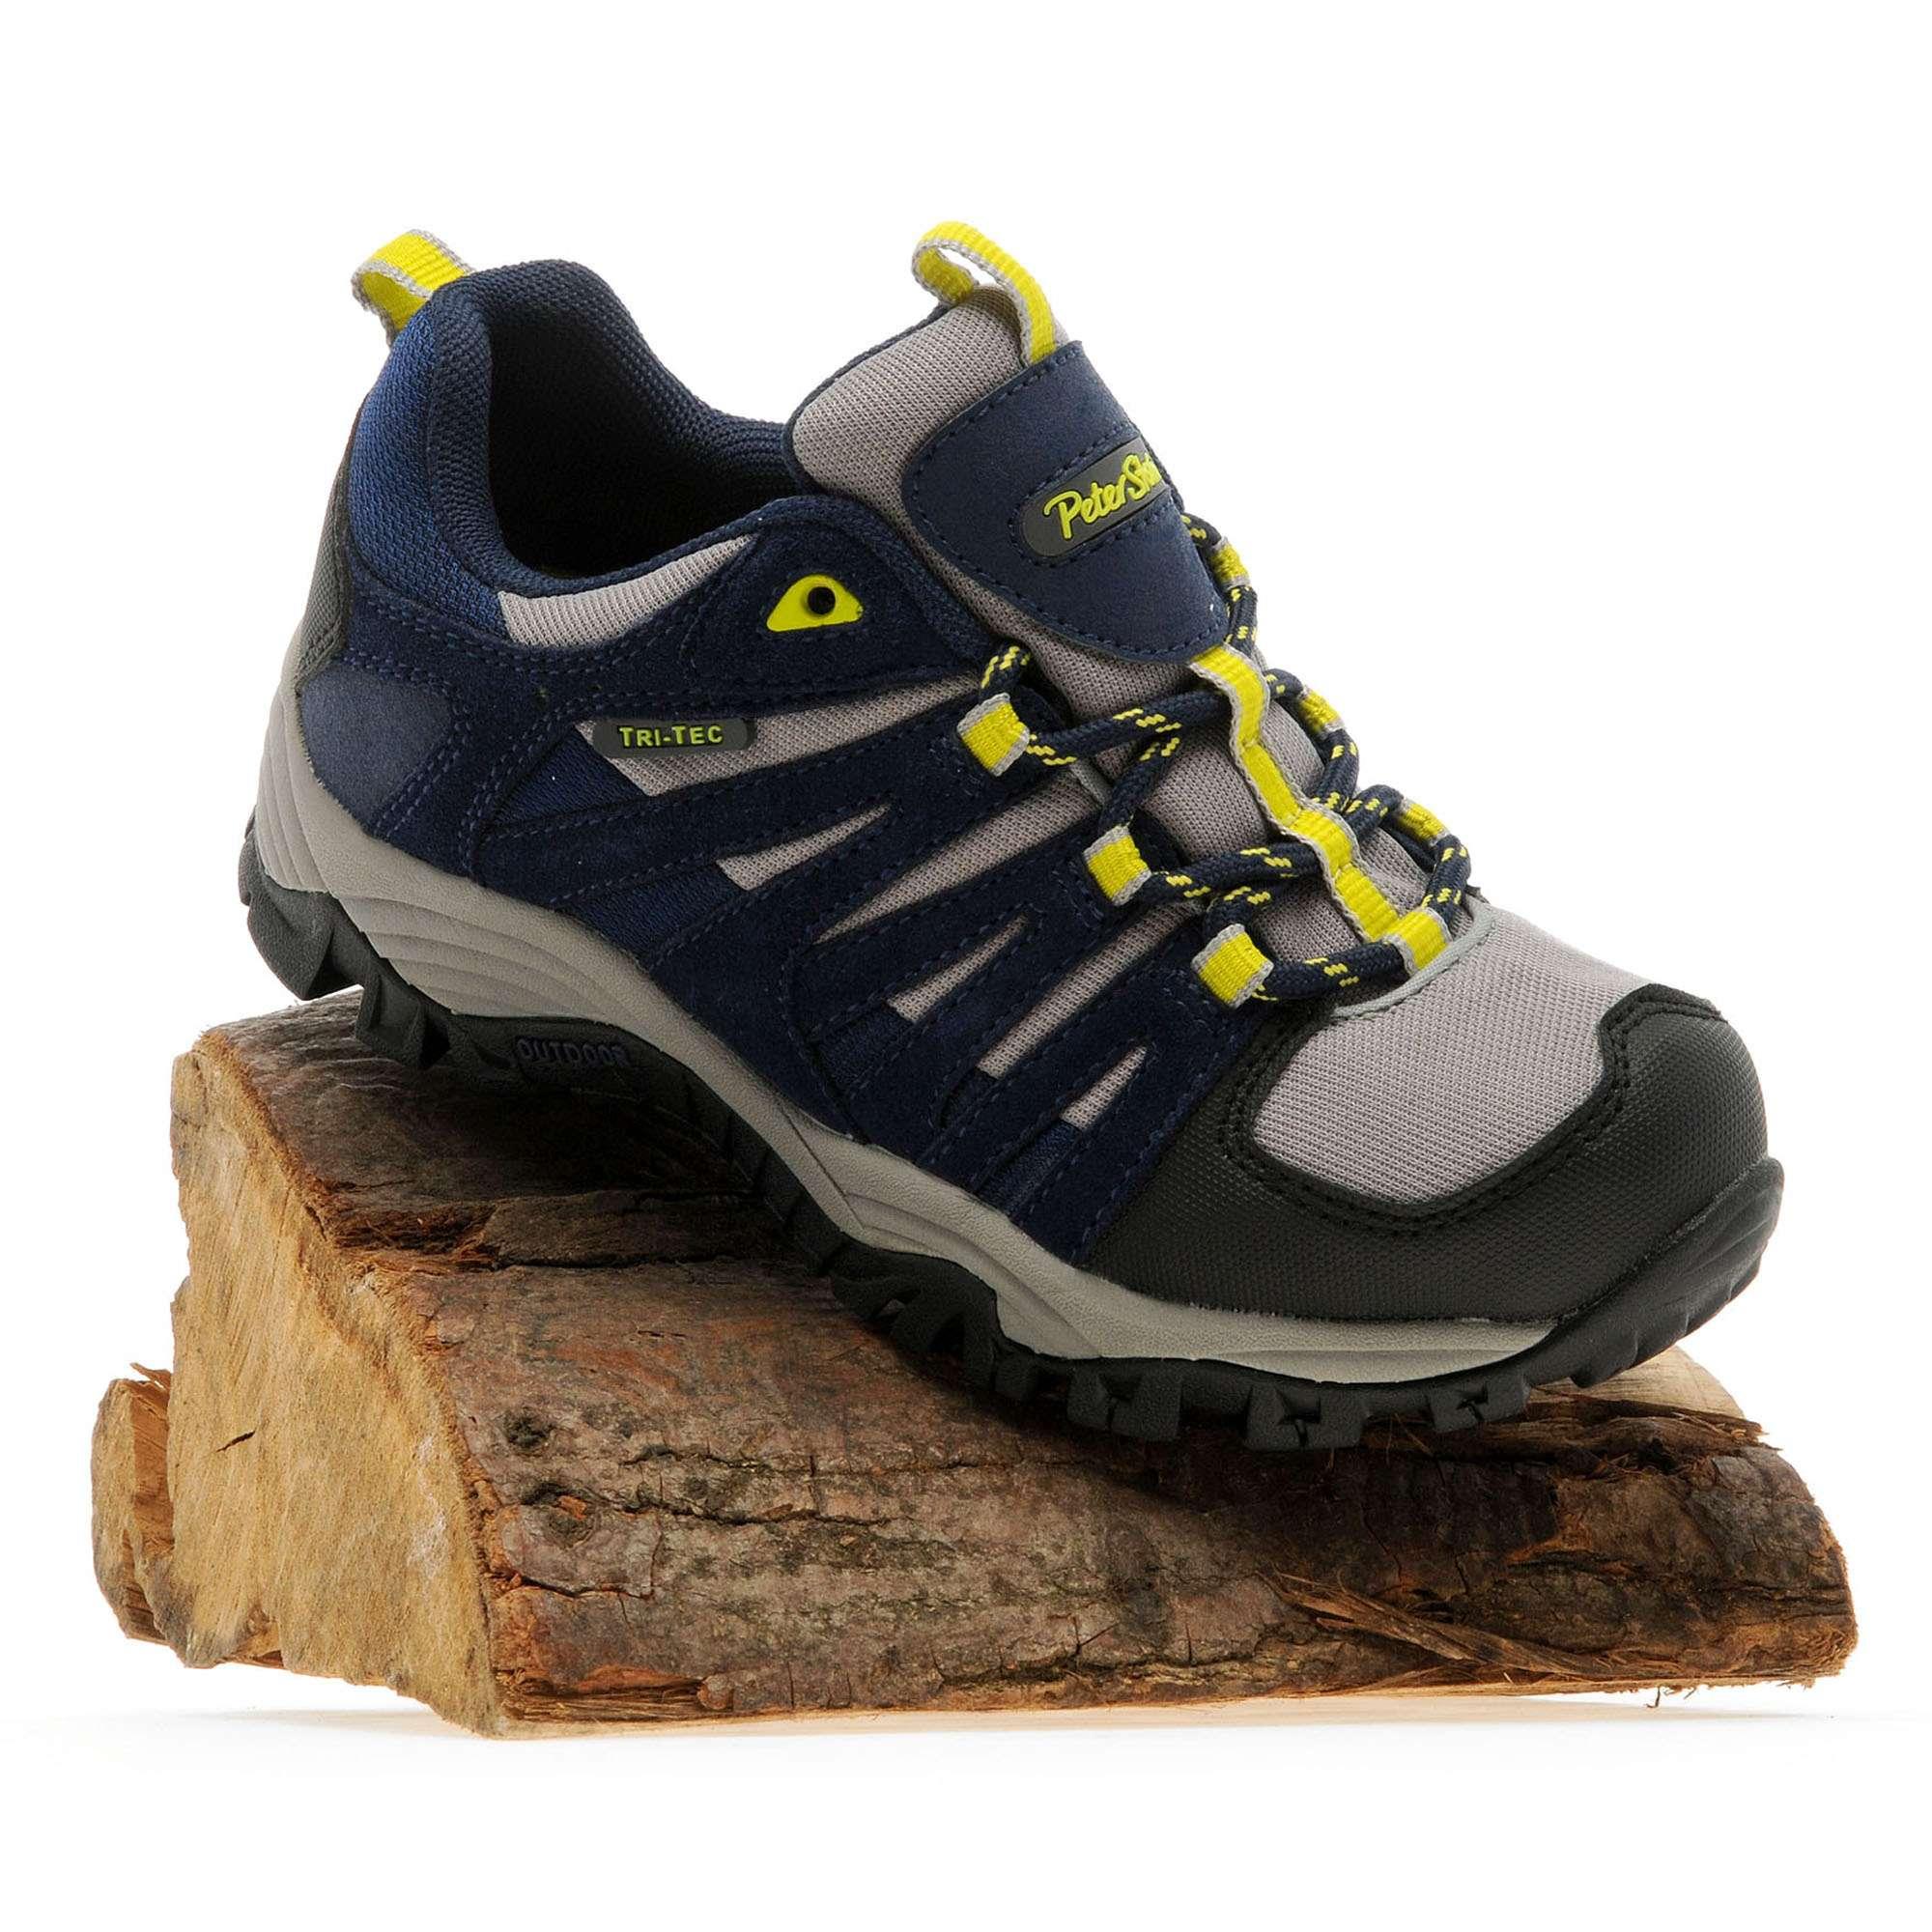 PETER STORM Boys' Barnston Hillwalking Shoe